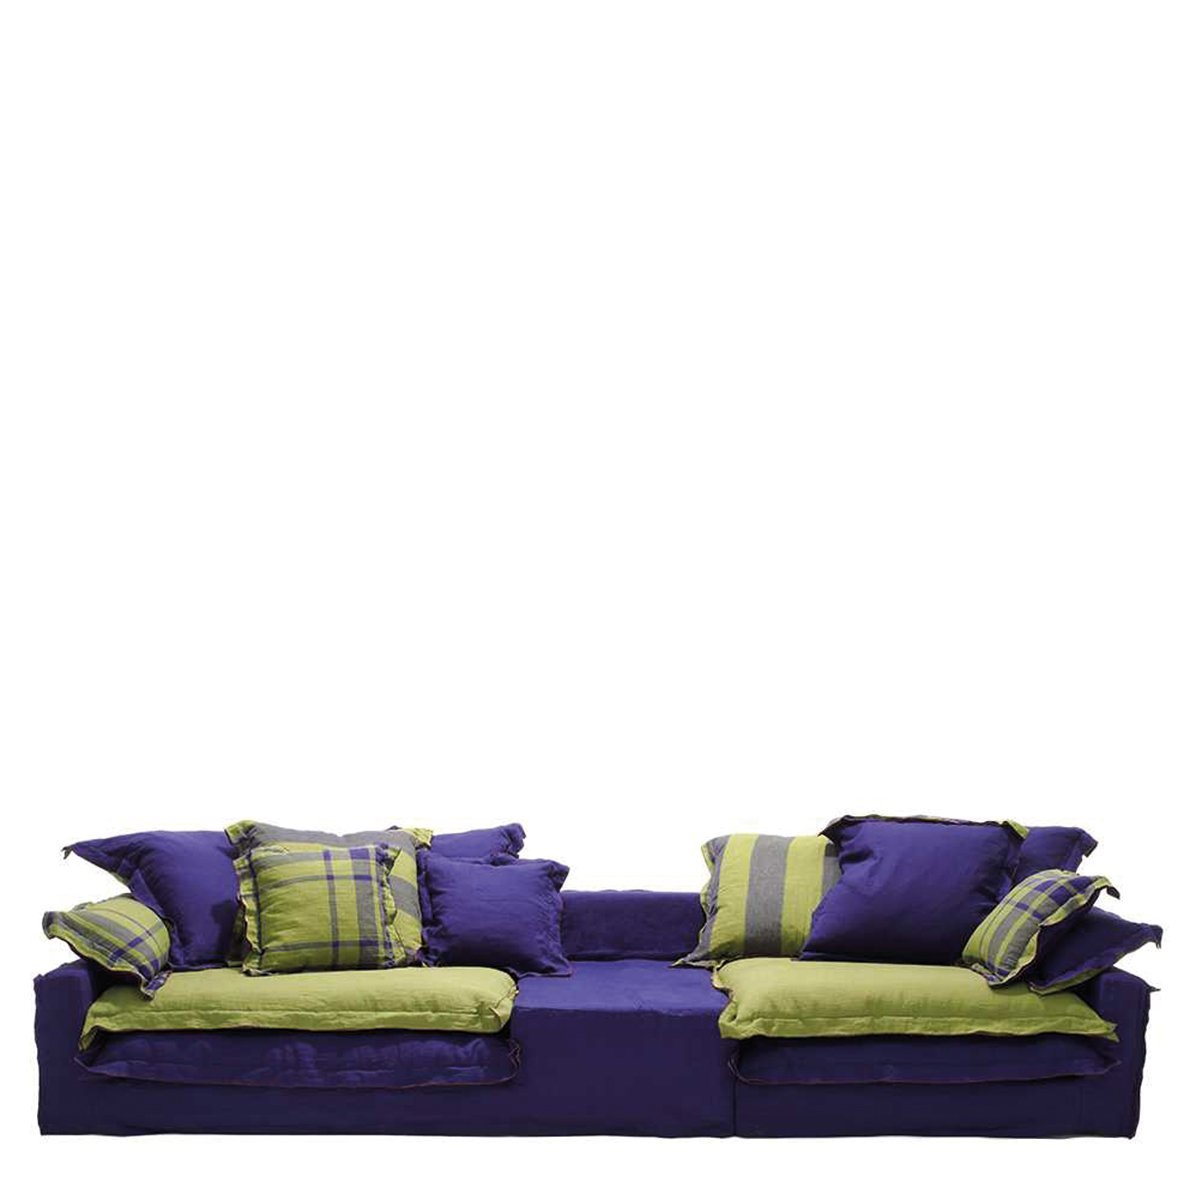 Linteloo Jan's New Elements Sofa Bank